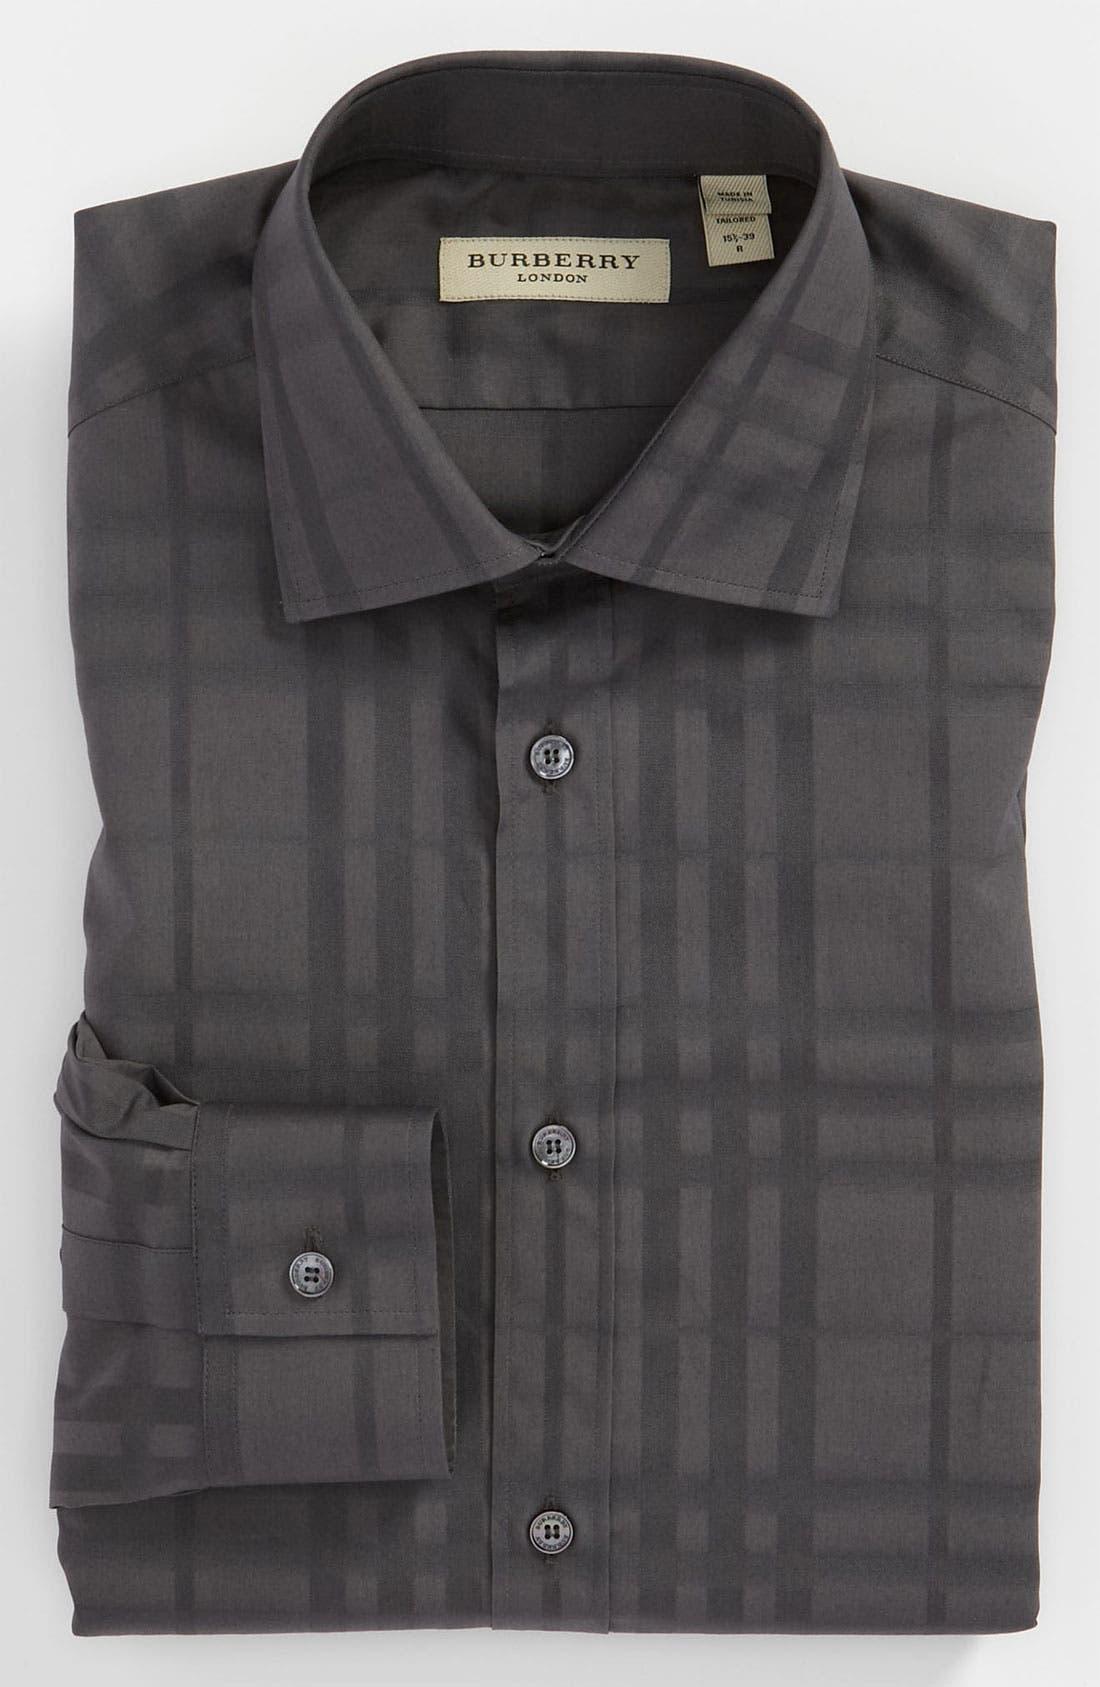 Main Image - Burberry London Trim Fit Dress Shirt